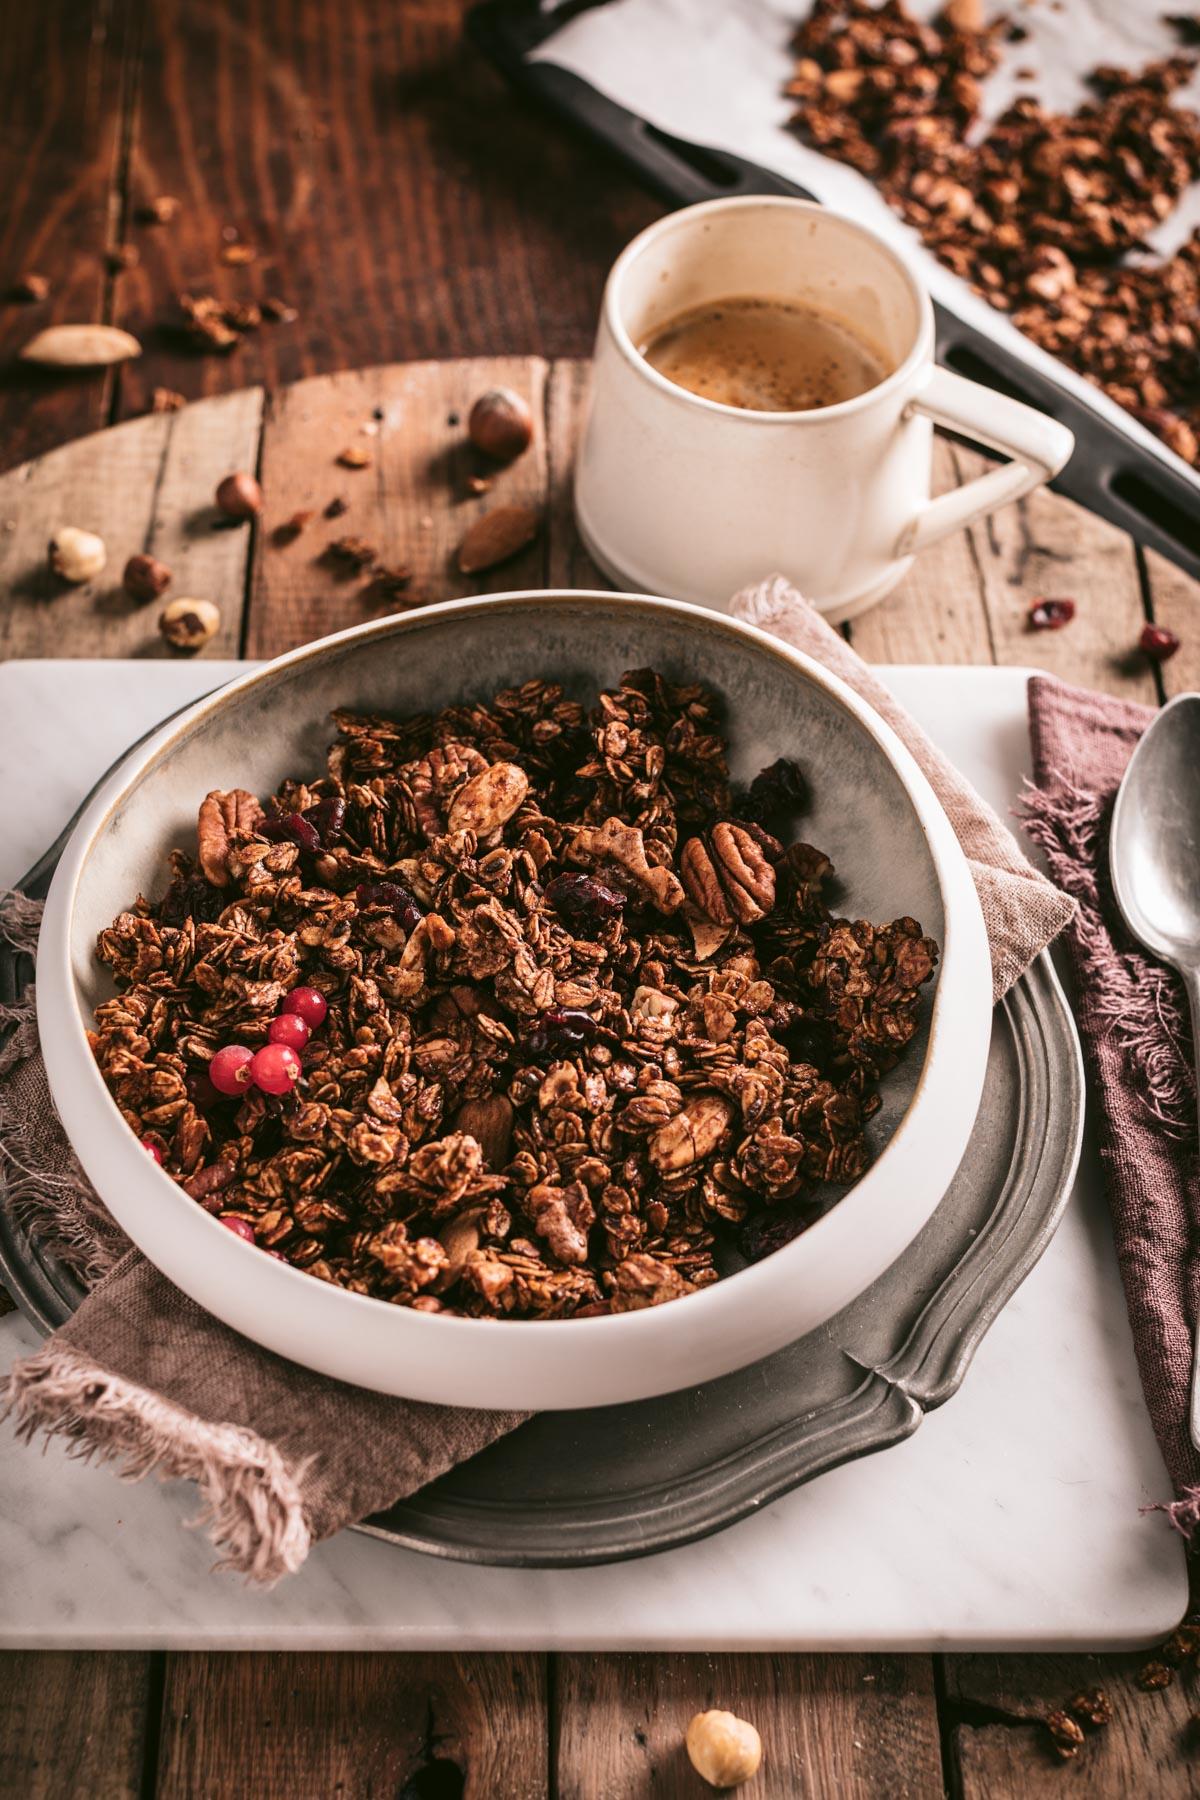 ricetta granola croccante cacao cannella nocciole noci mandorle vegan crunchy spiced nut granola clusters autumn granola recipe with oats buckwheat gluten-free